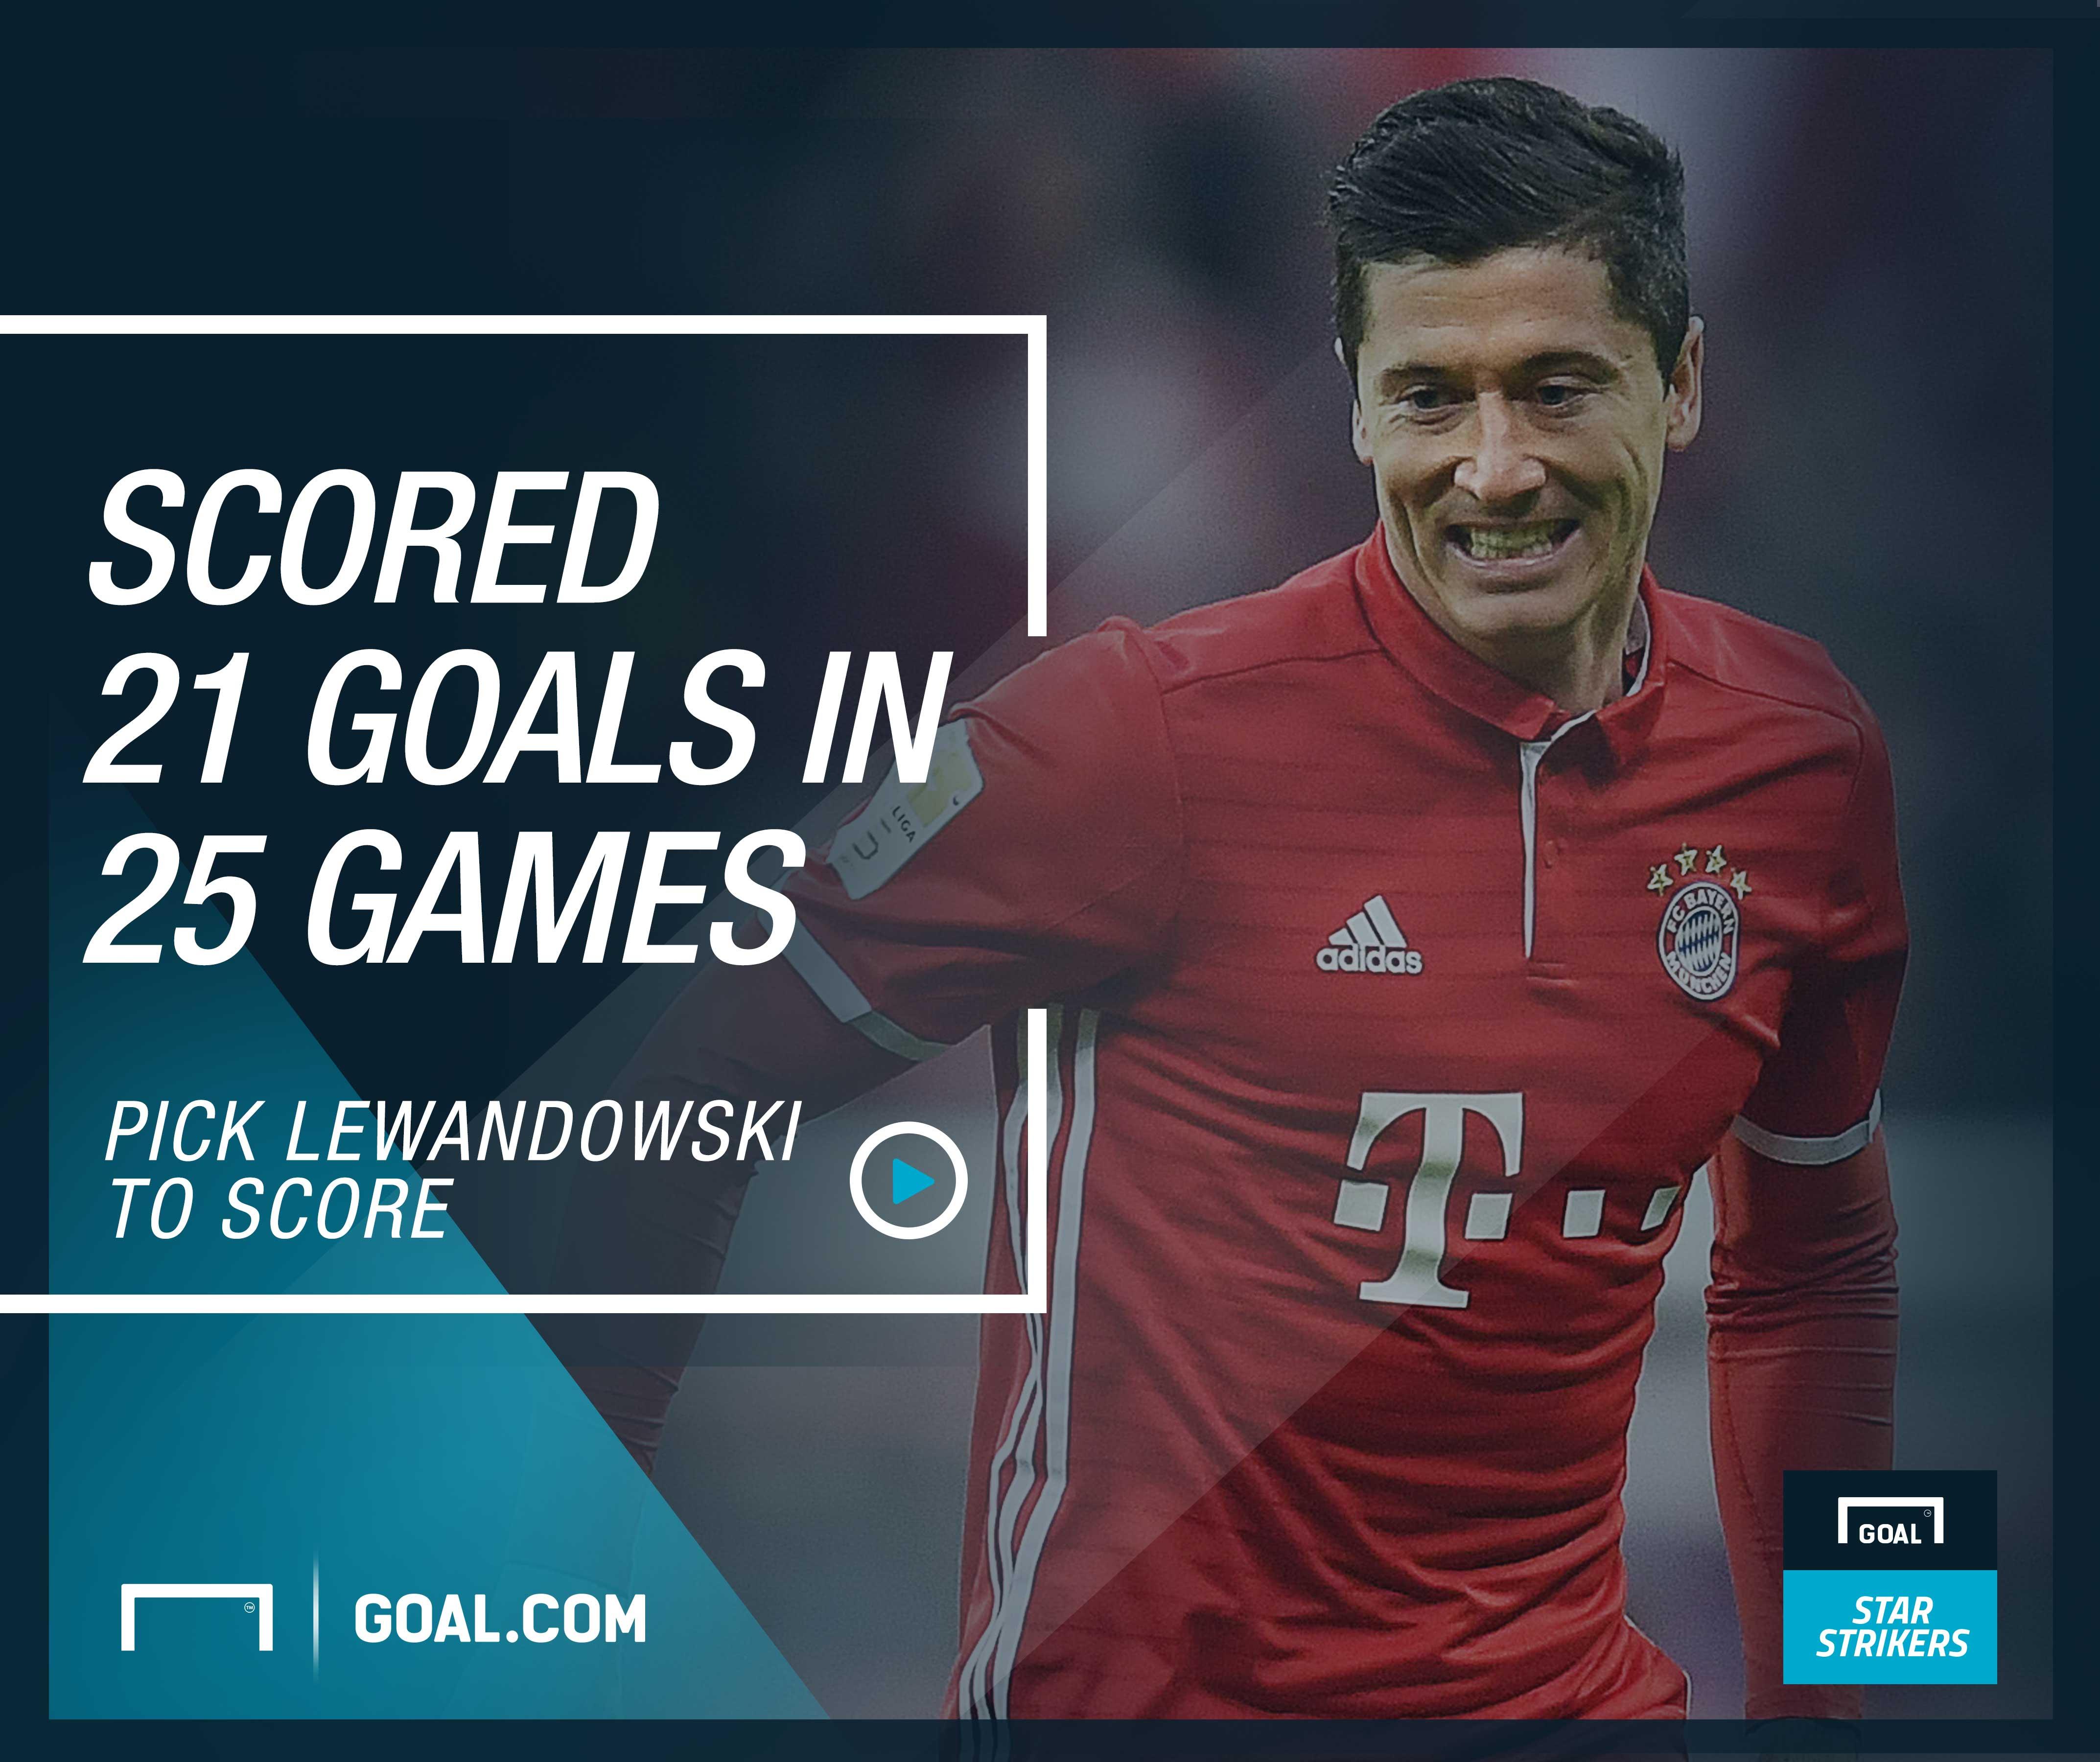 Goal Star Strikers Lewandowksi